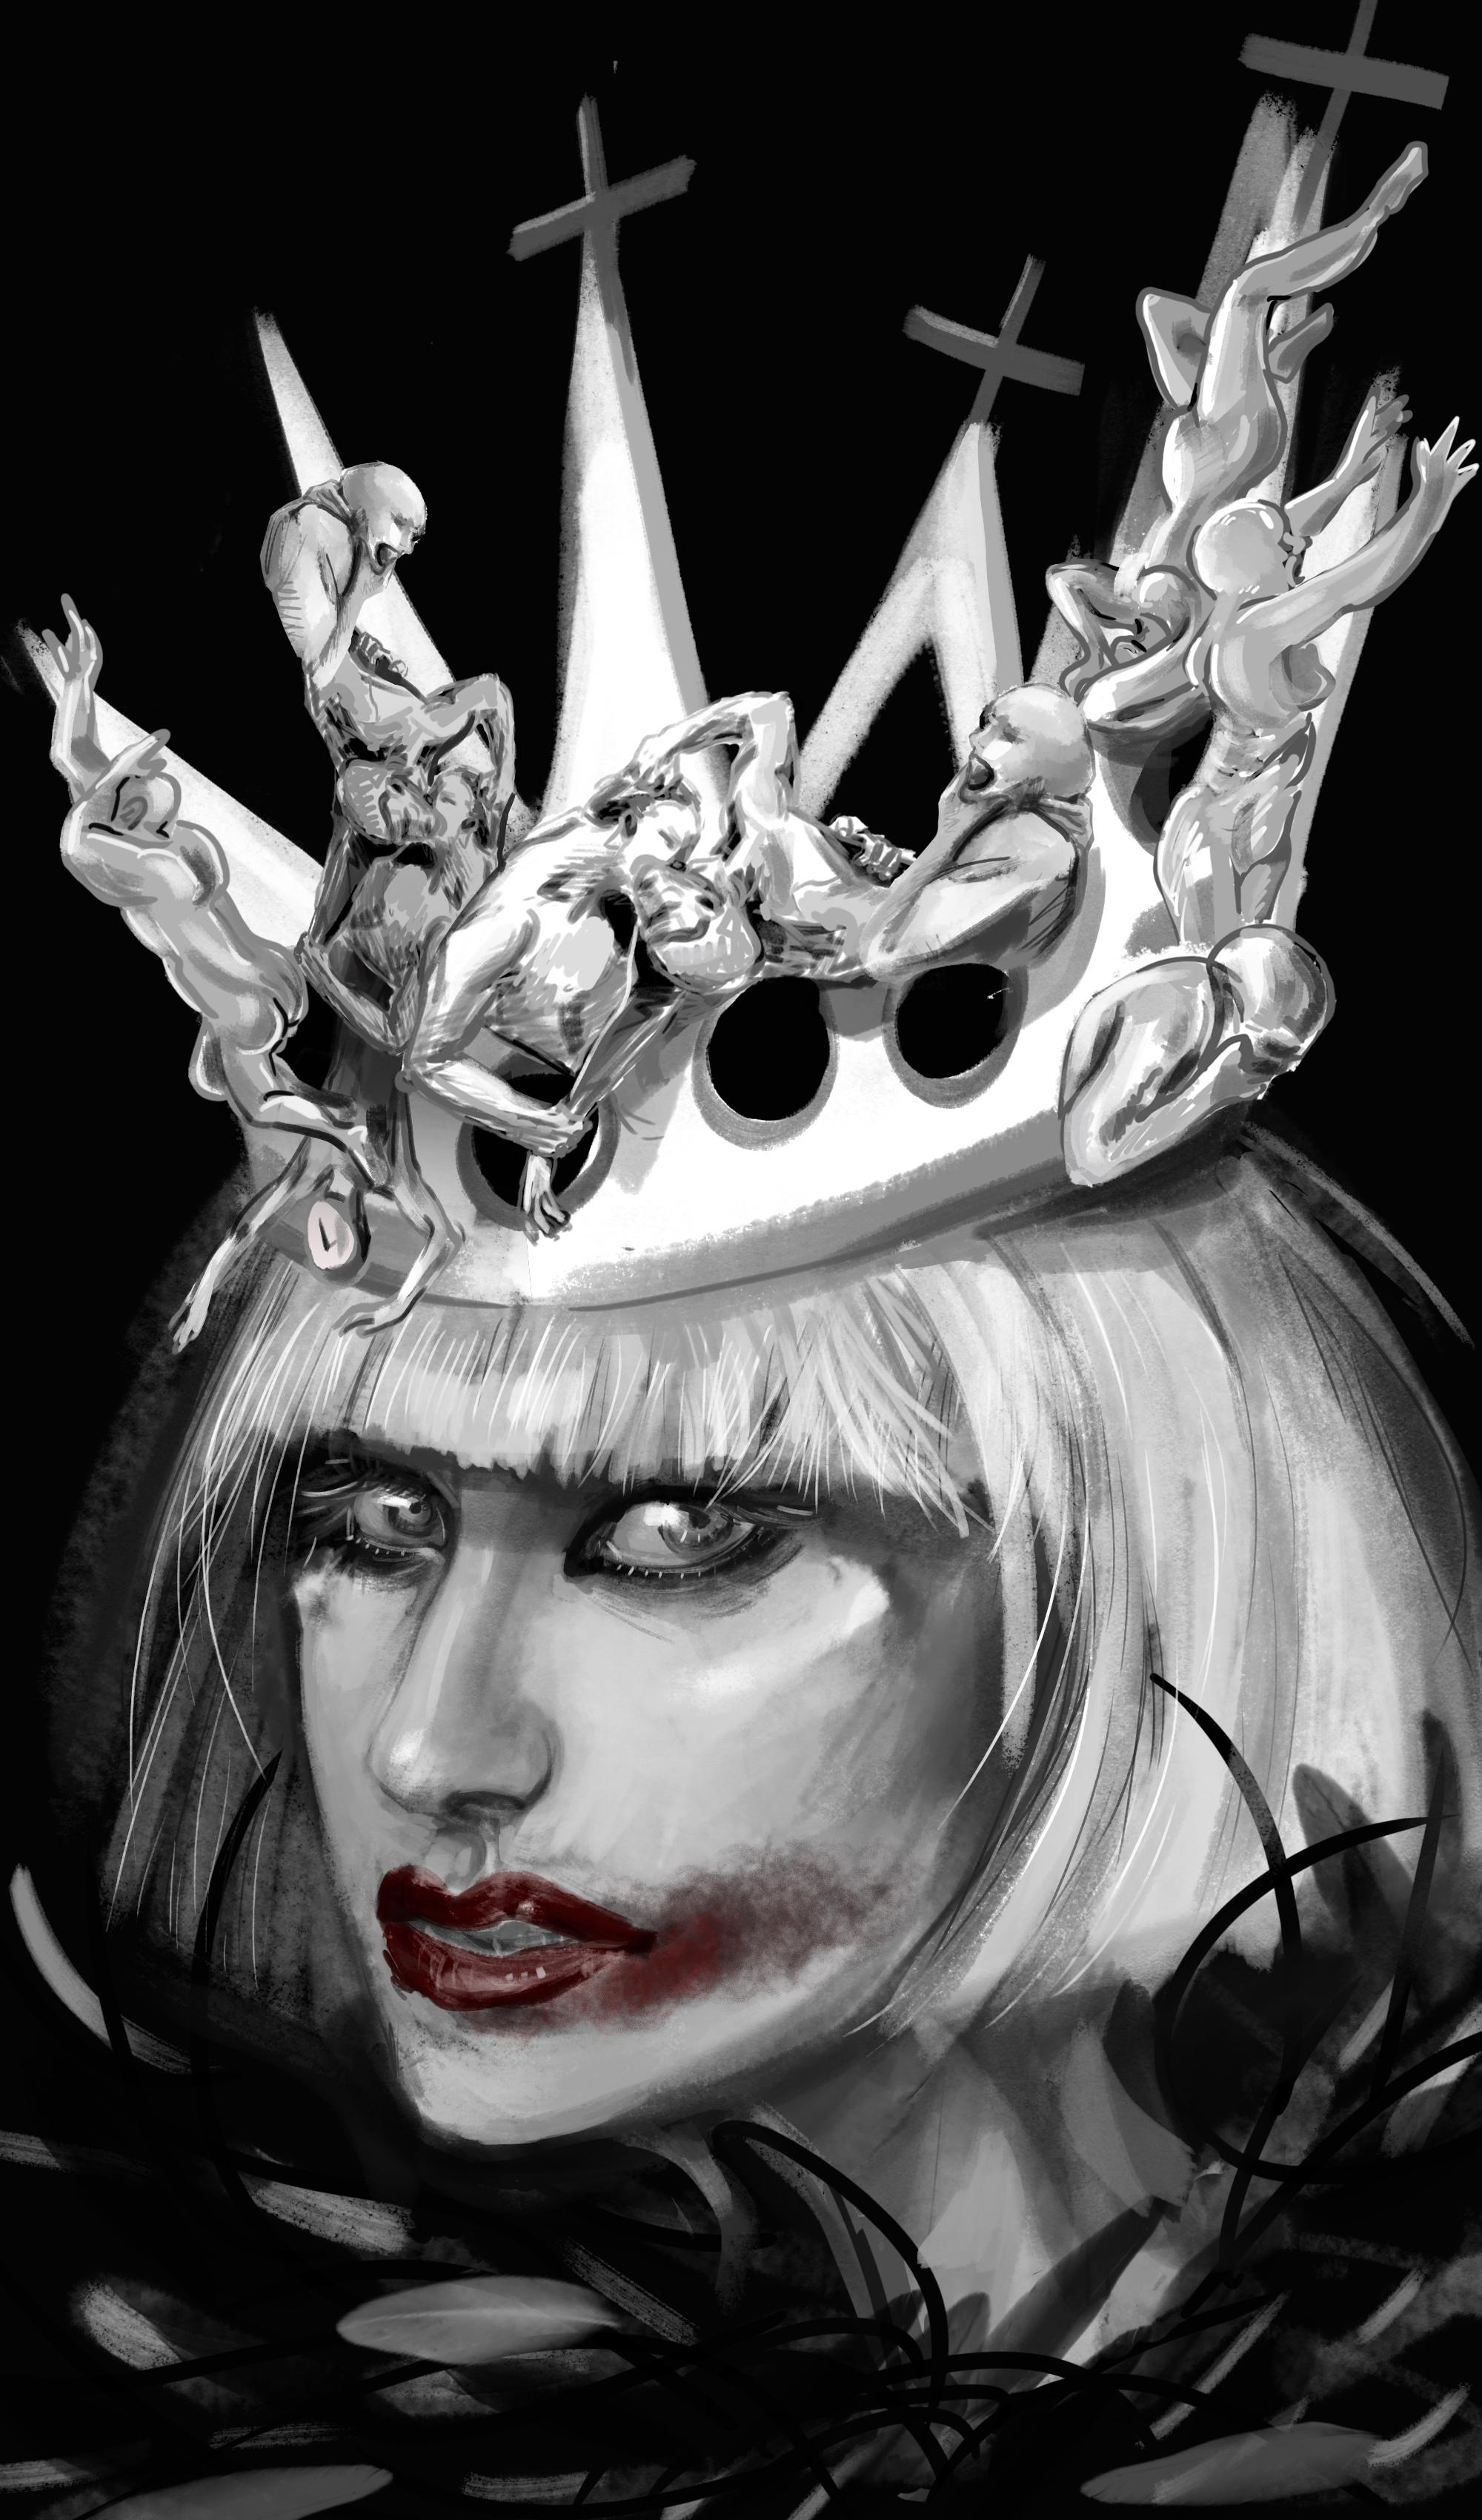 Lady Gaga character design